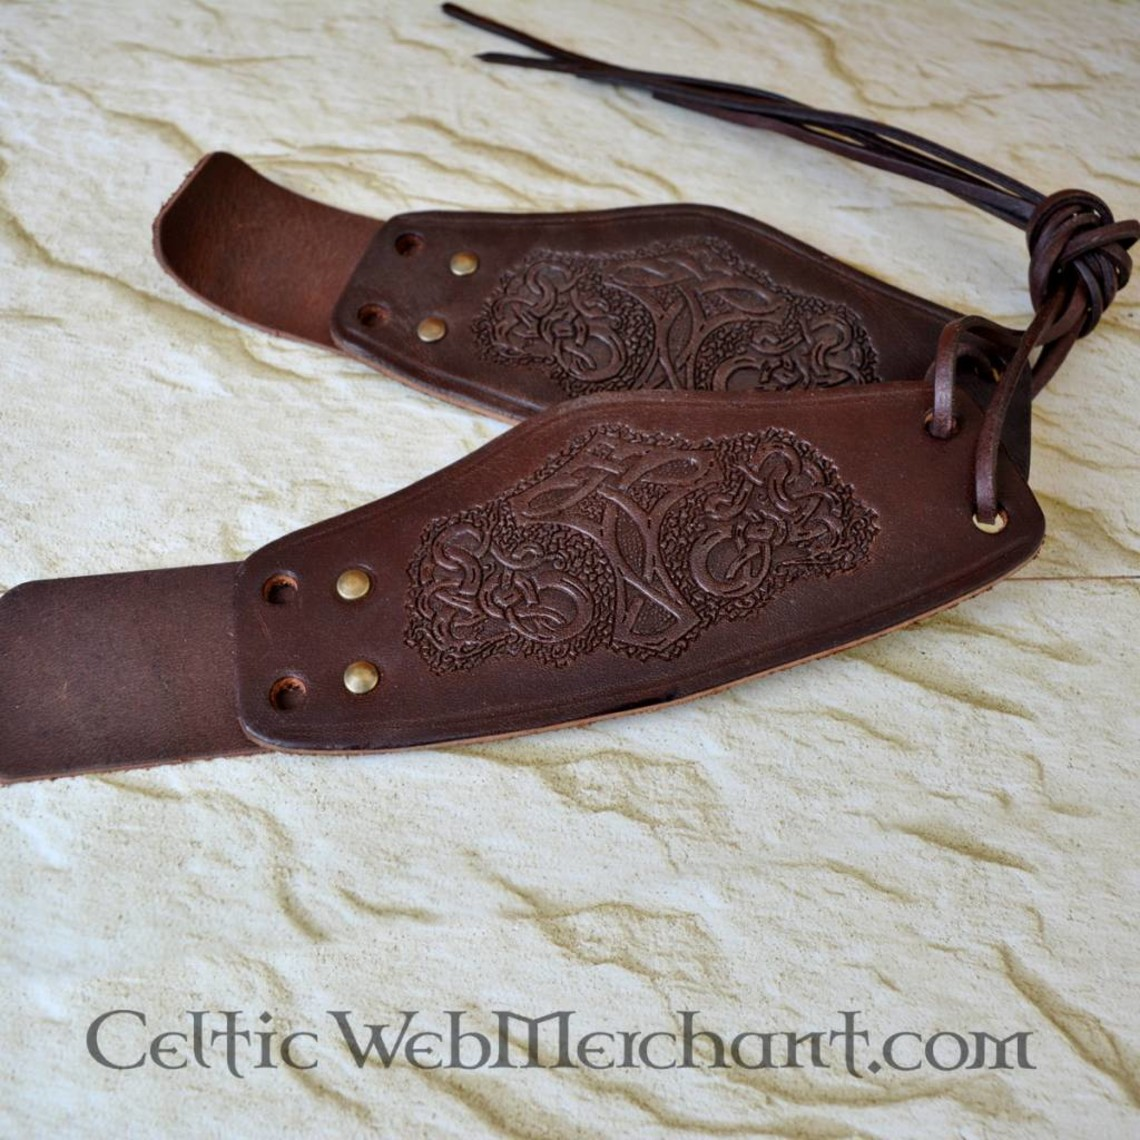 Par Viking håndledsbeskyttere